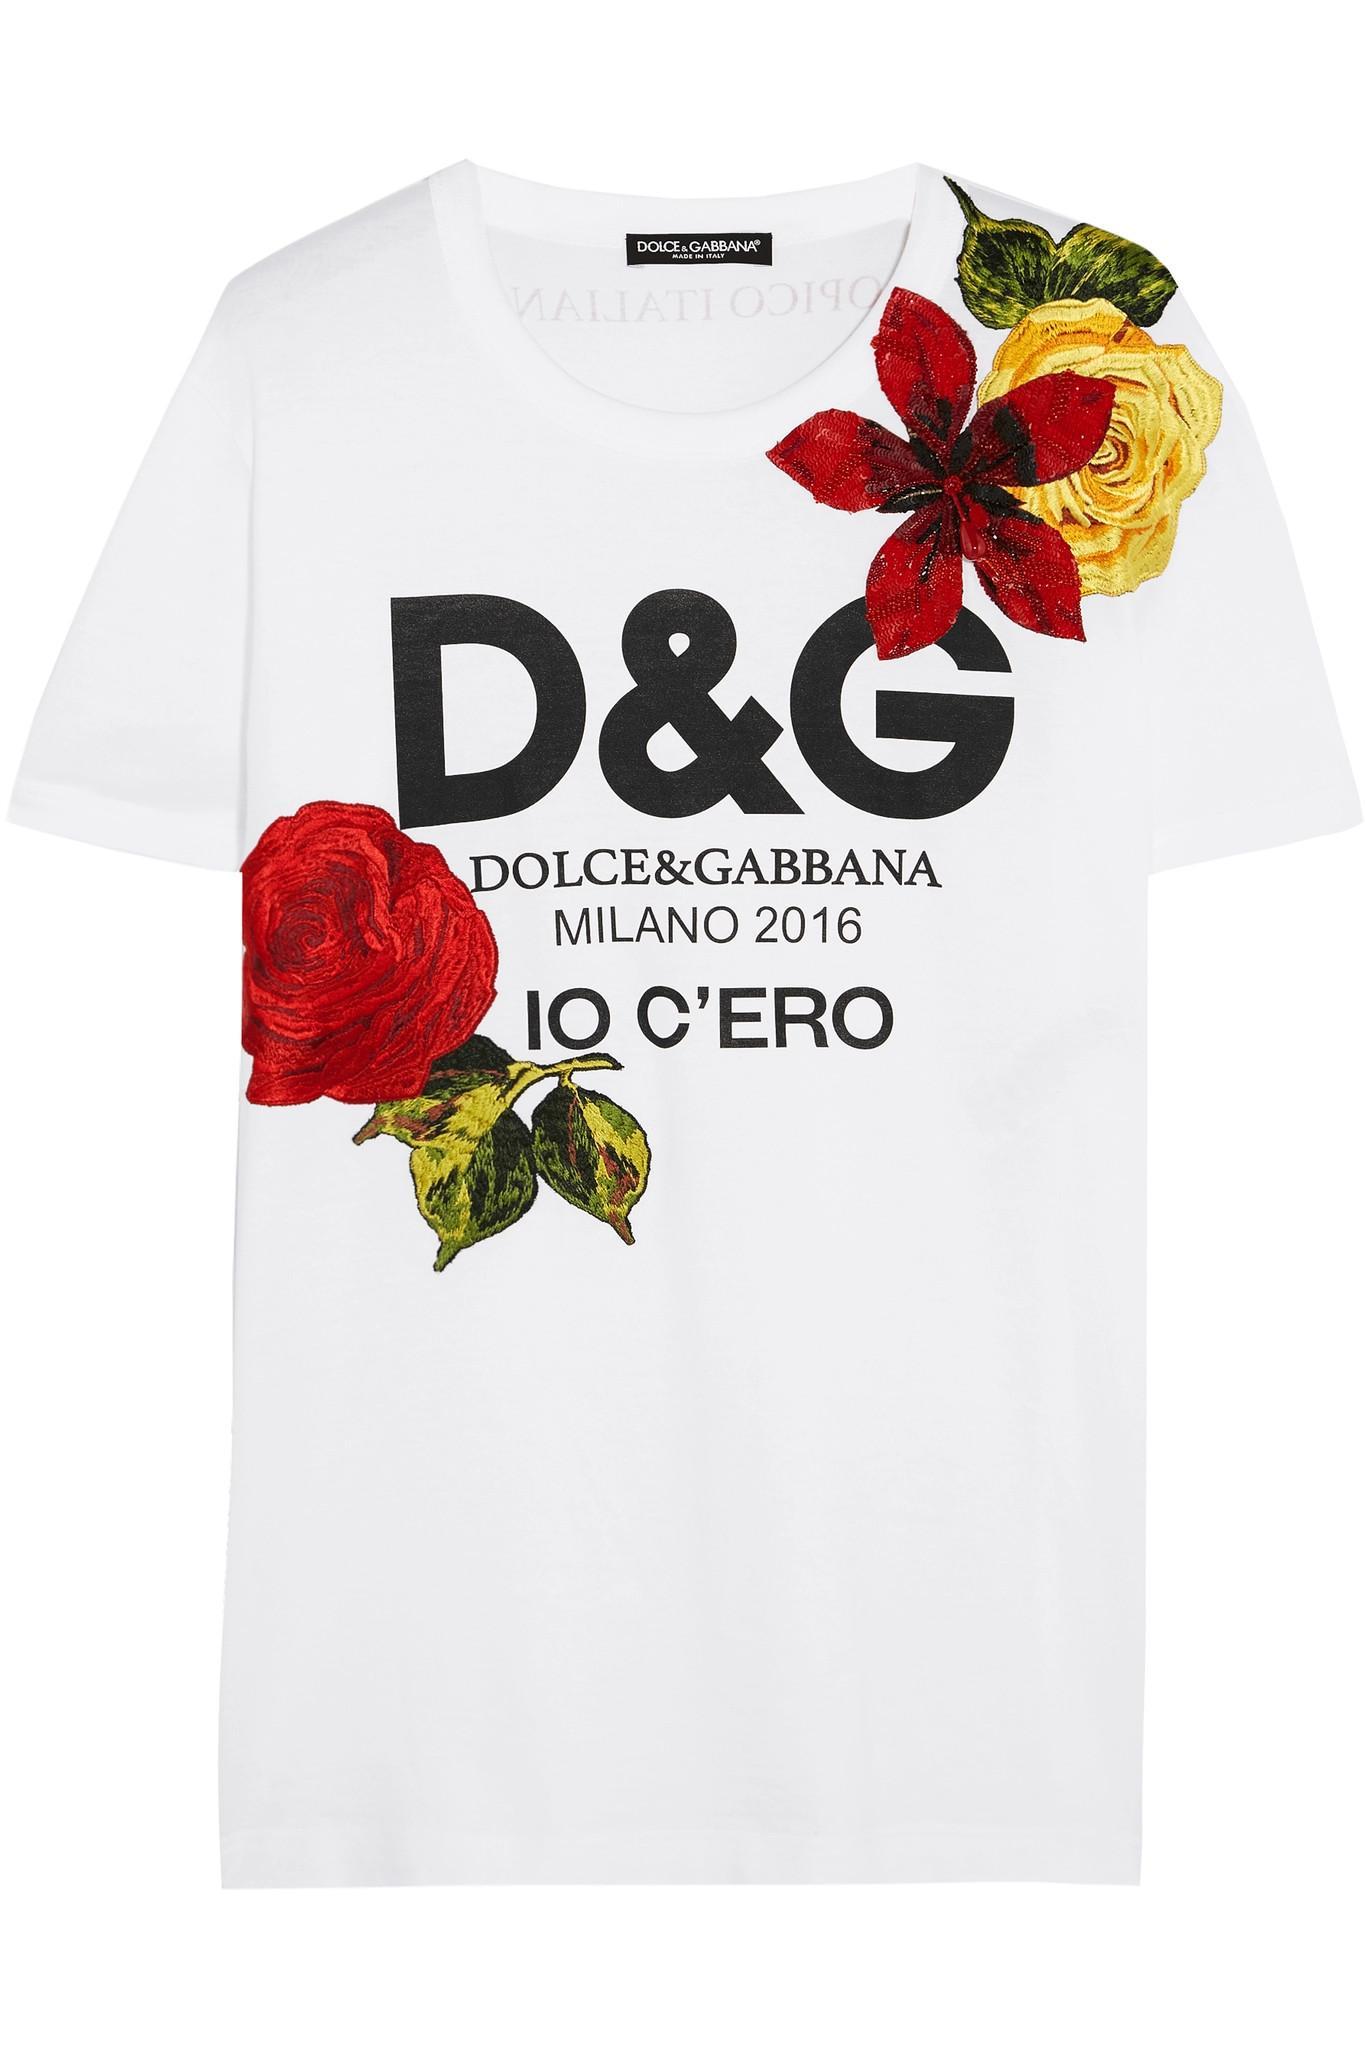 Dolce gabbana embellished printed cotton jersey t shirt for Dolce gabbana t shirt women